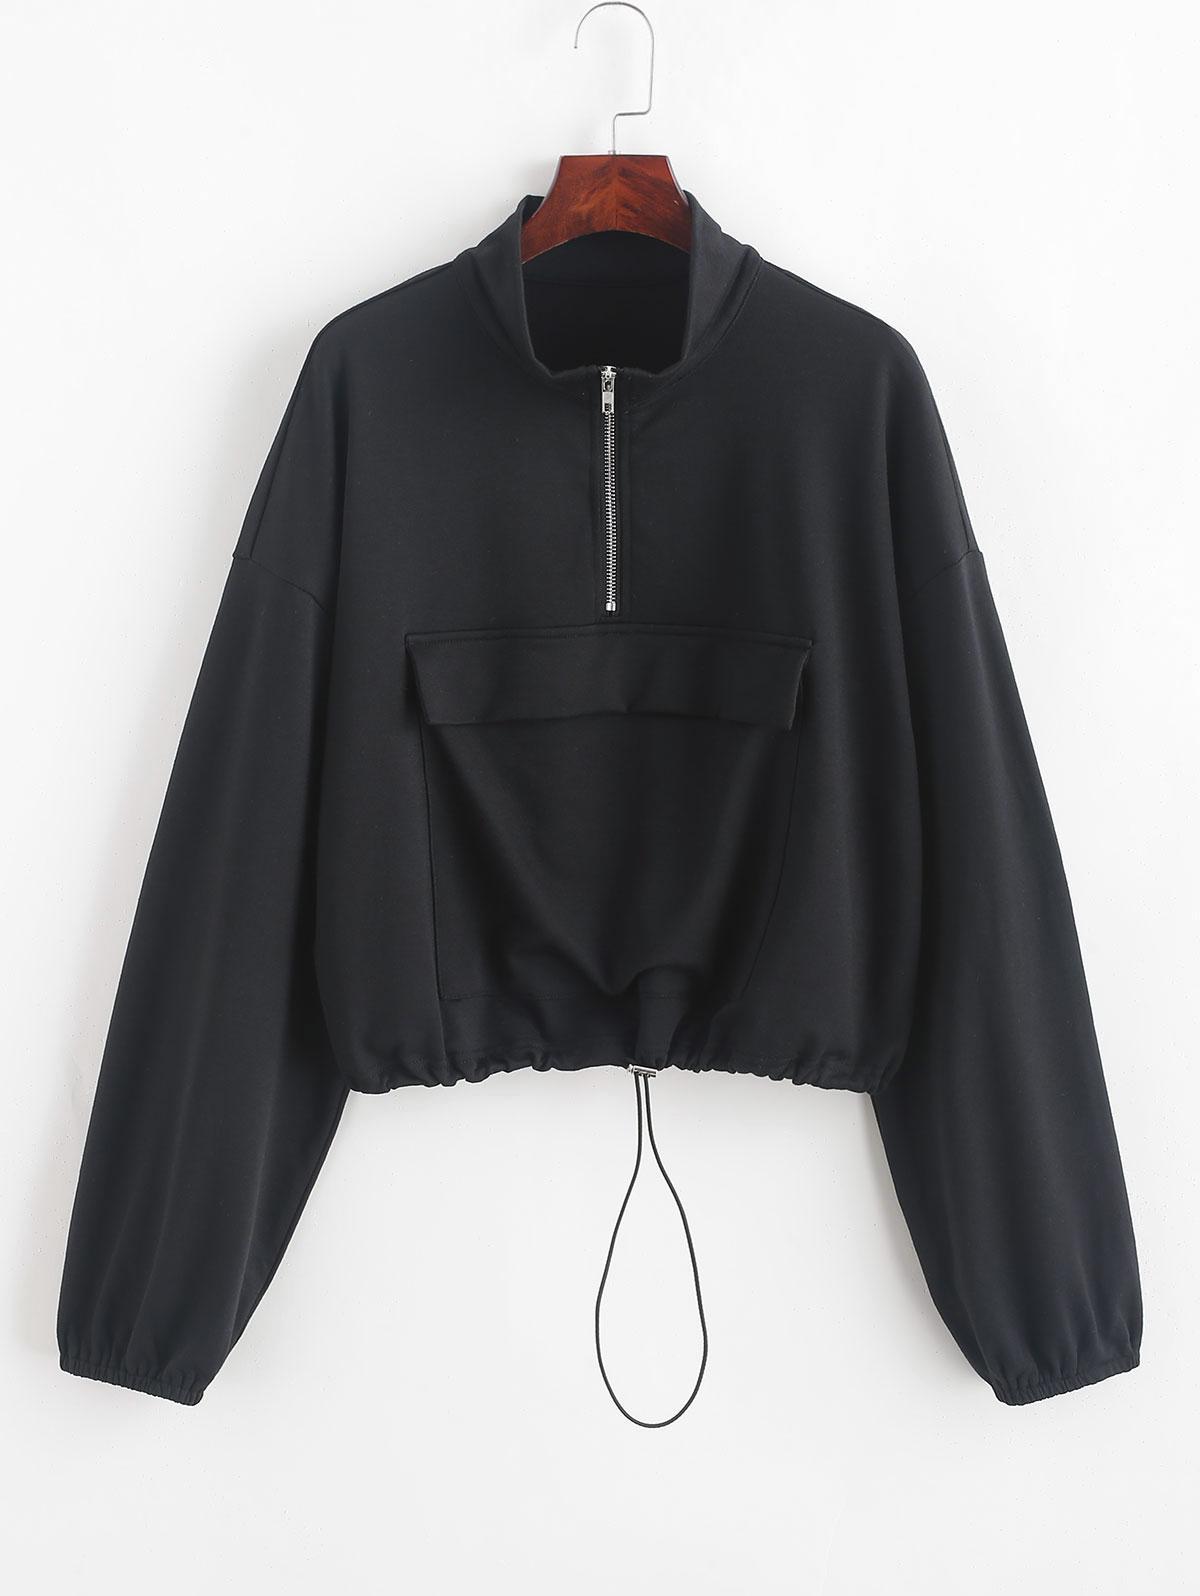 ZAFUL Half Zip Front Pocket Drawstring Sweatshirt, Black